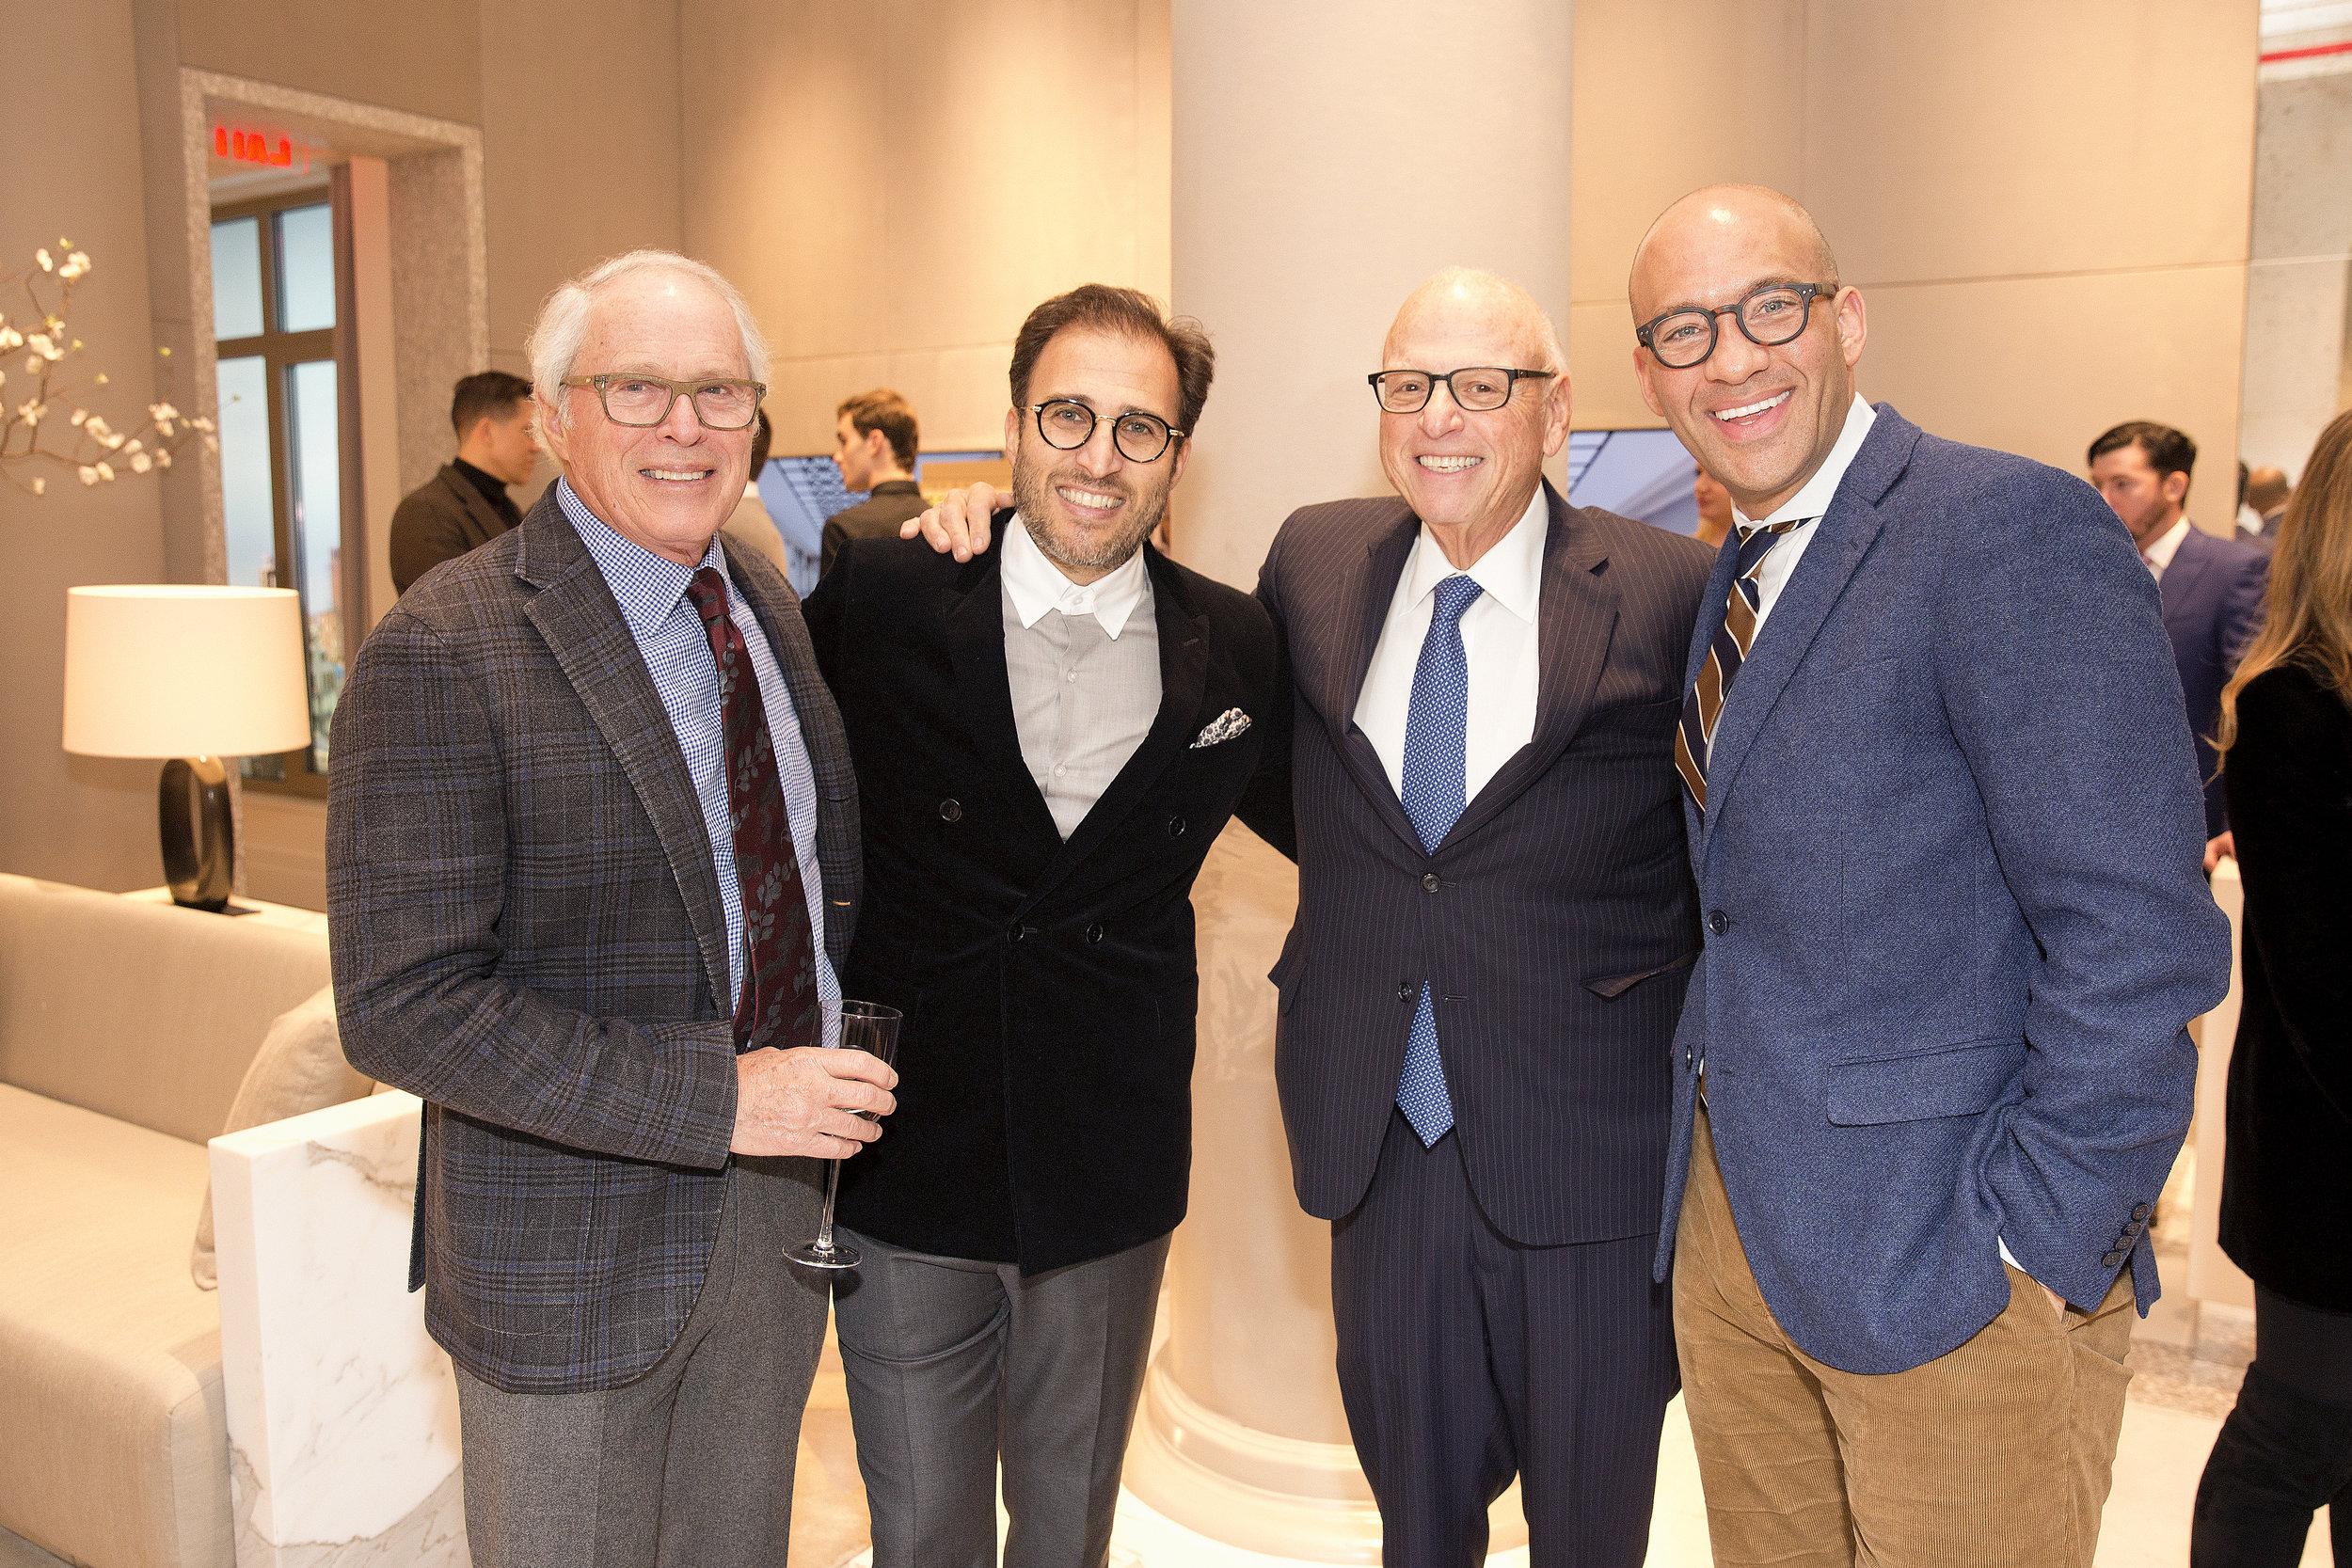 Raymond Chalmé (left center), Howard Lorber (right center), John Gomes (right)